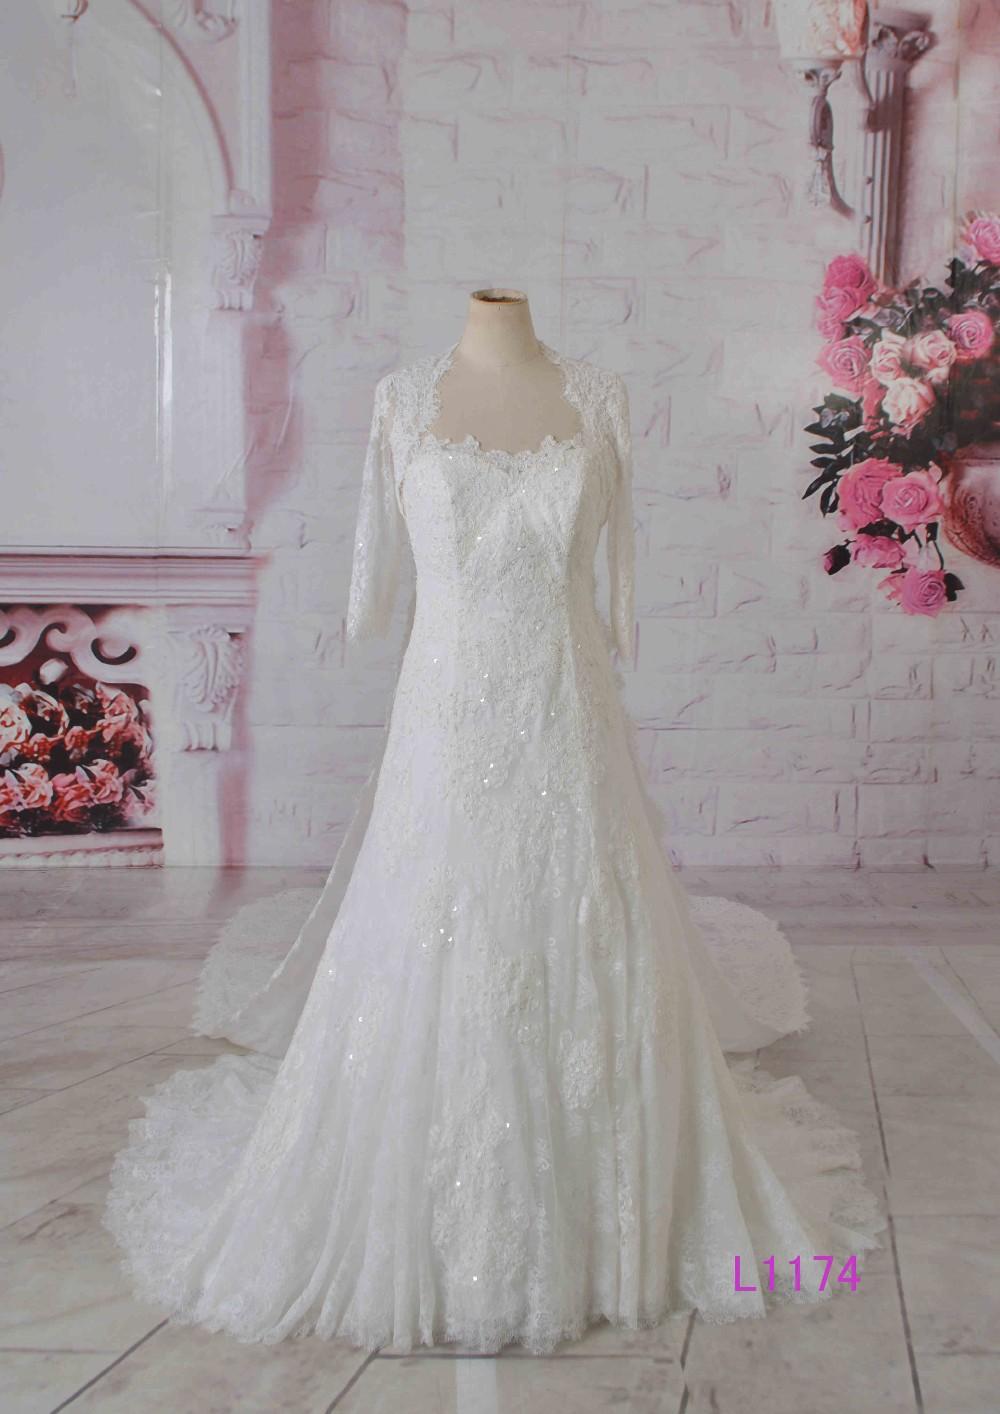 Dubai Muslim Bridal Gown 34 Long Sleeves Jacket Lace Wedding Dress Patterns Buy Wedding Gownswedding Dressbridal Gown Product On Alibabacom